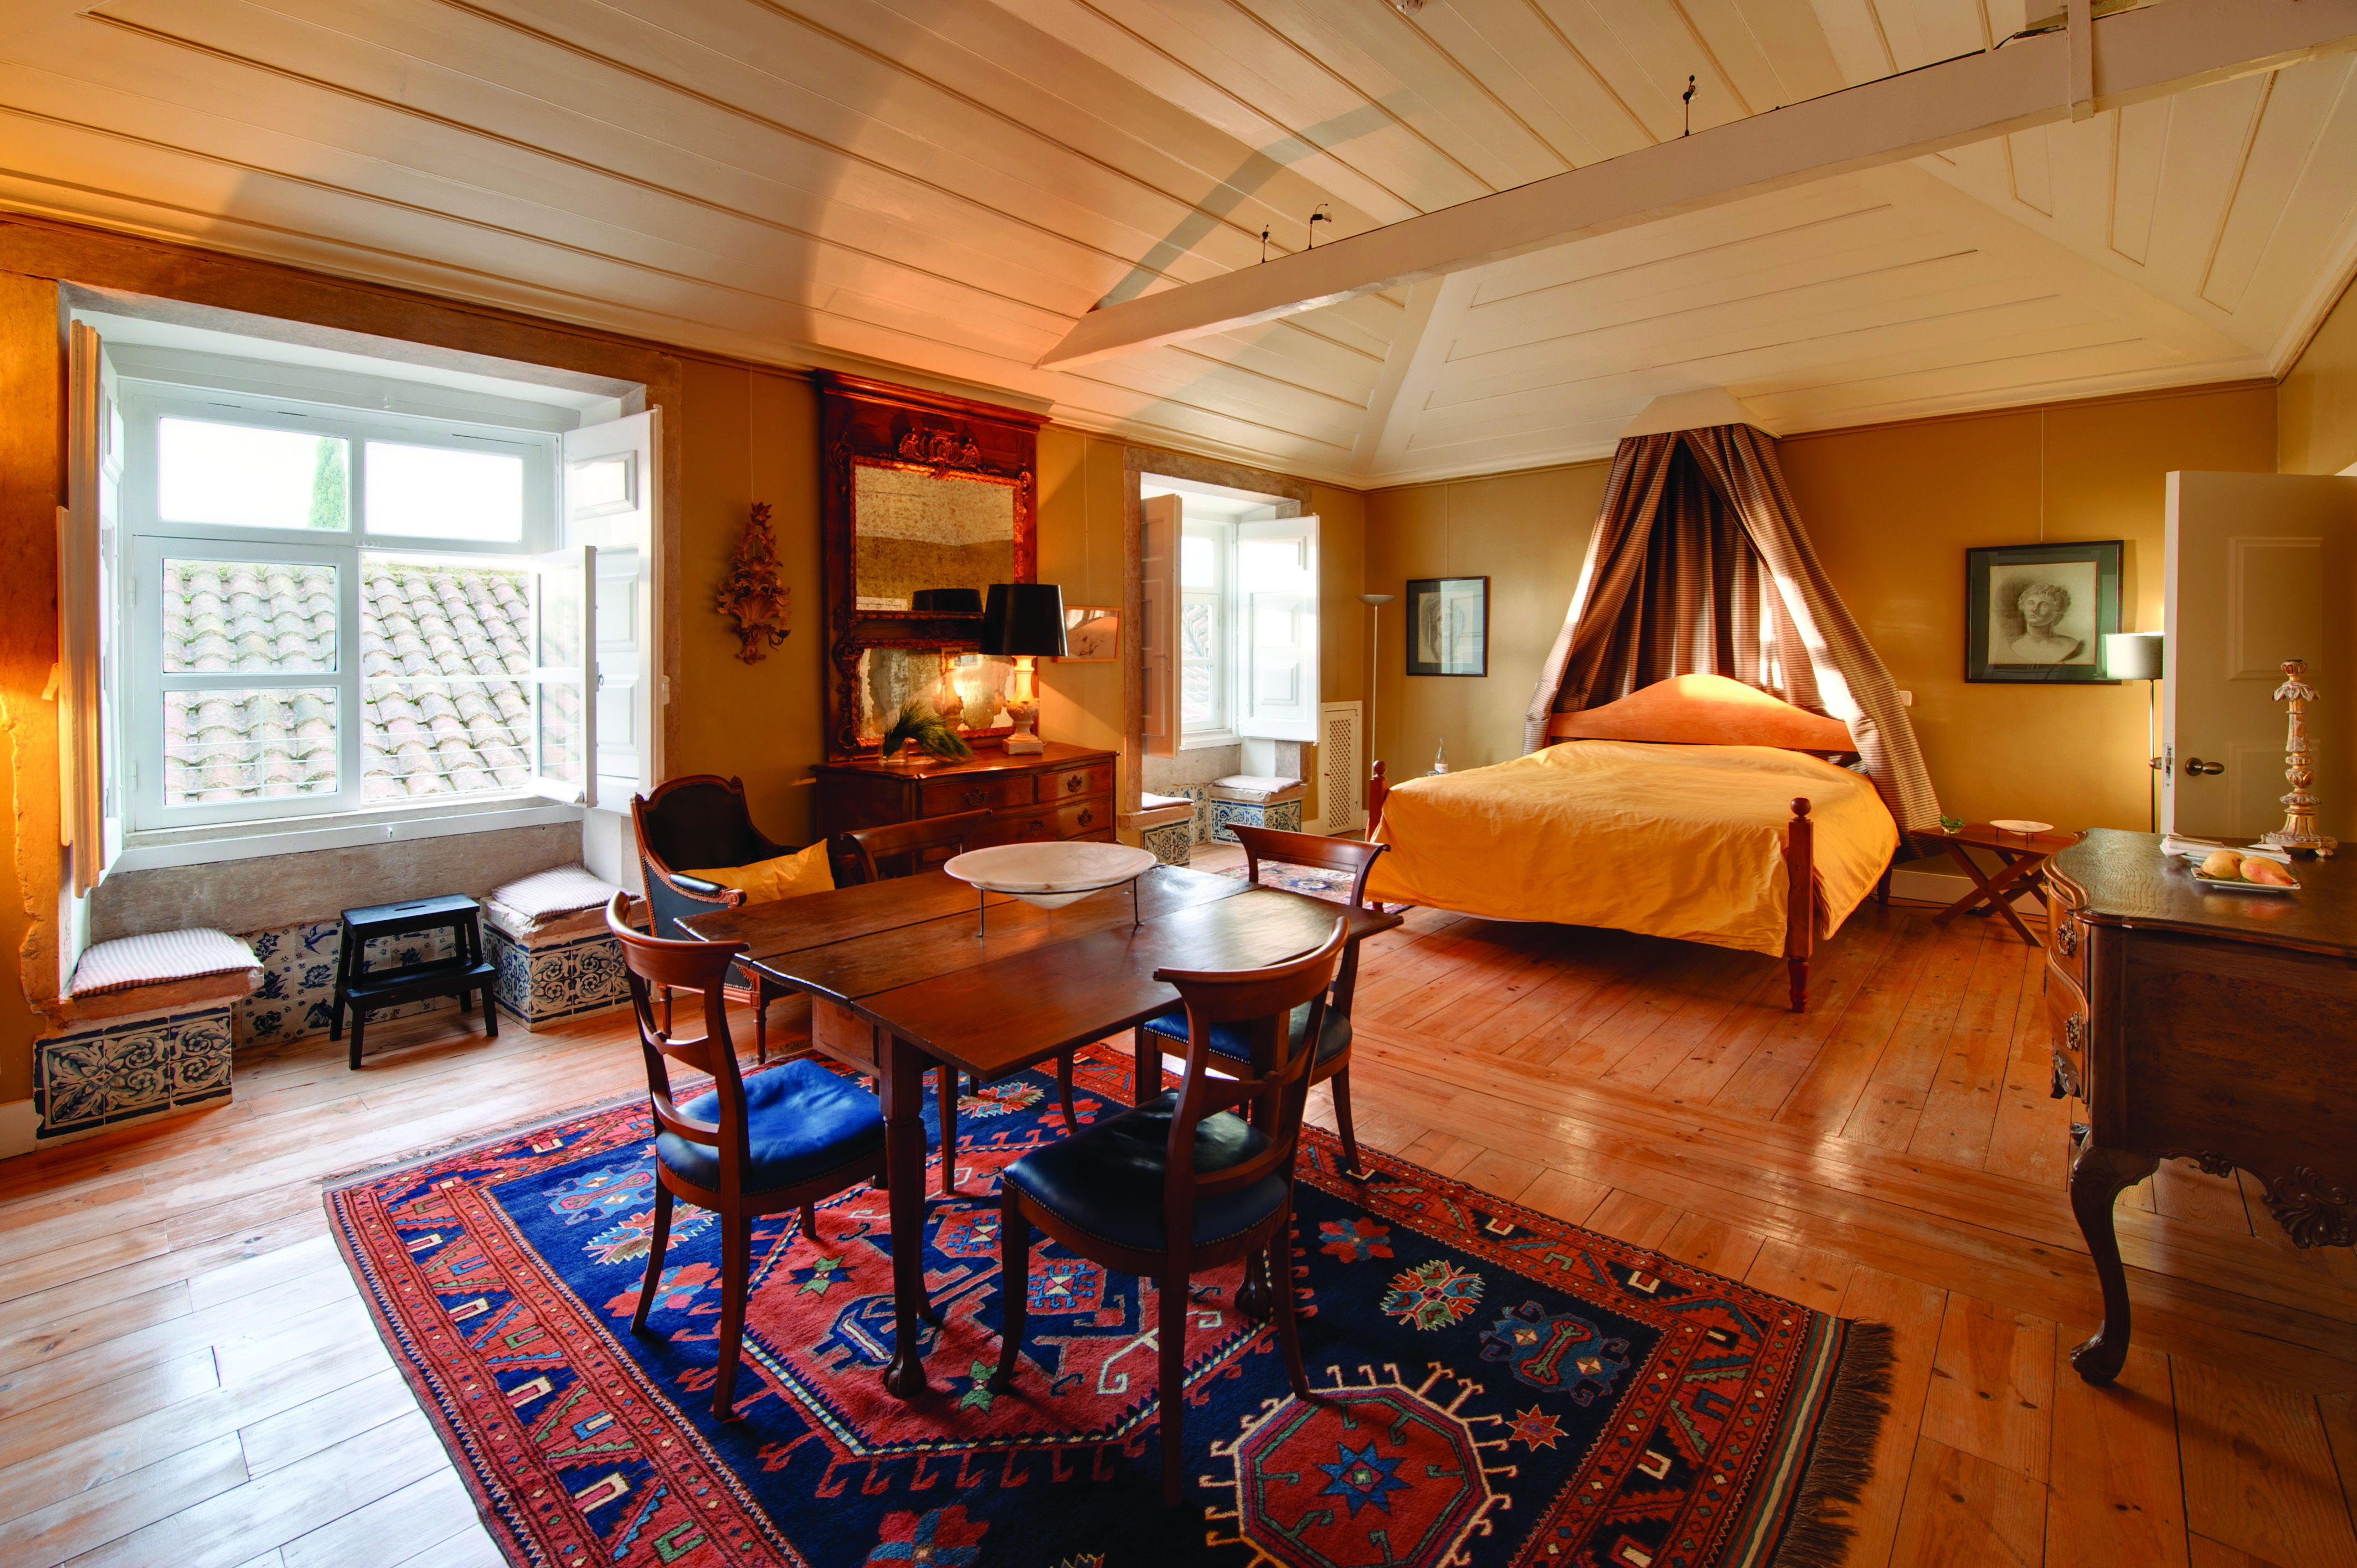 Palacio Belmonte 6 Agostinho da Silva Suite - Joe Condron #Lisbon #PalacioBelmonte #LuxuryHotels #TravelPortugal